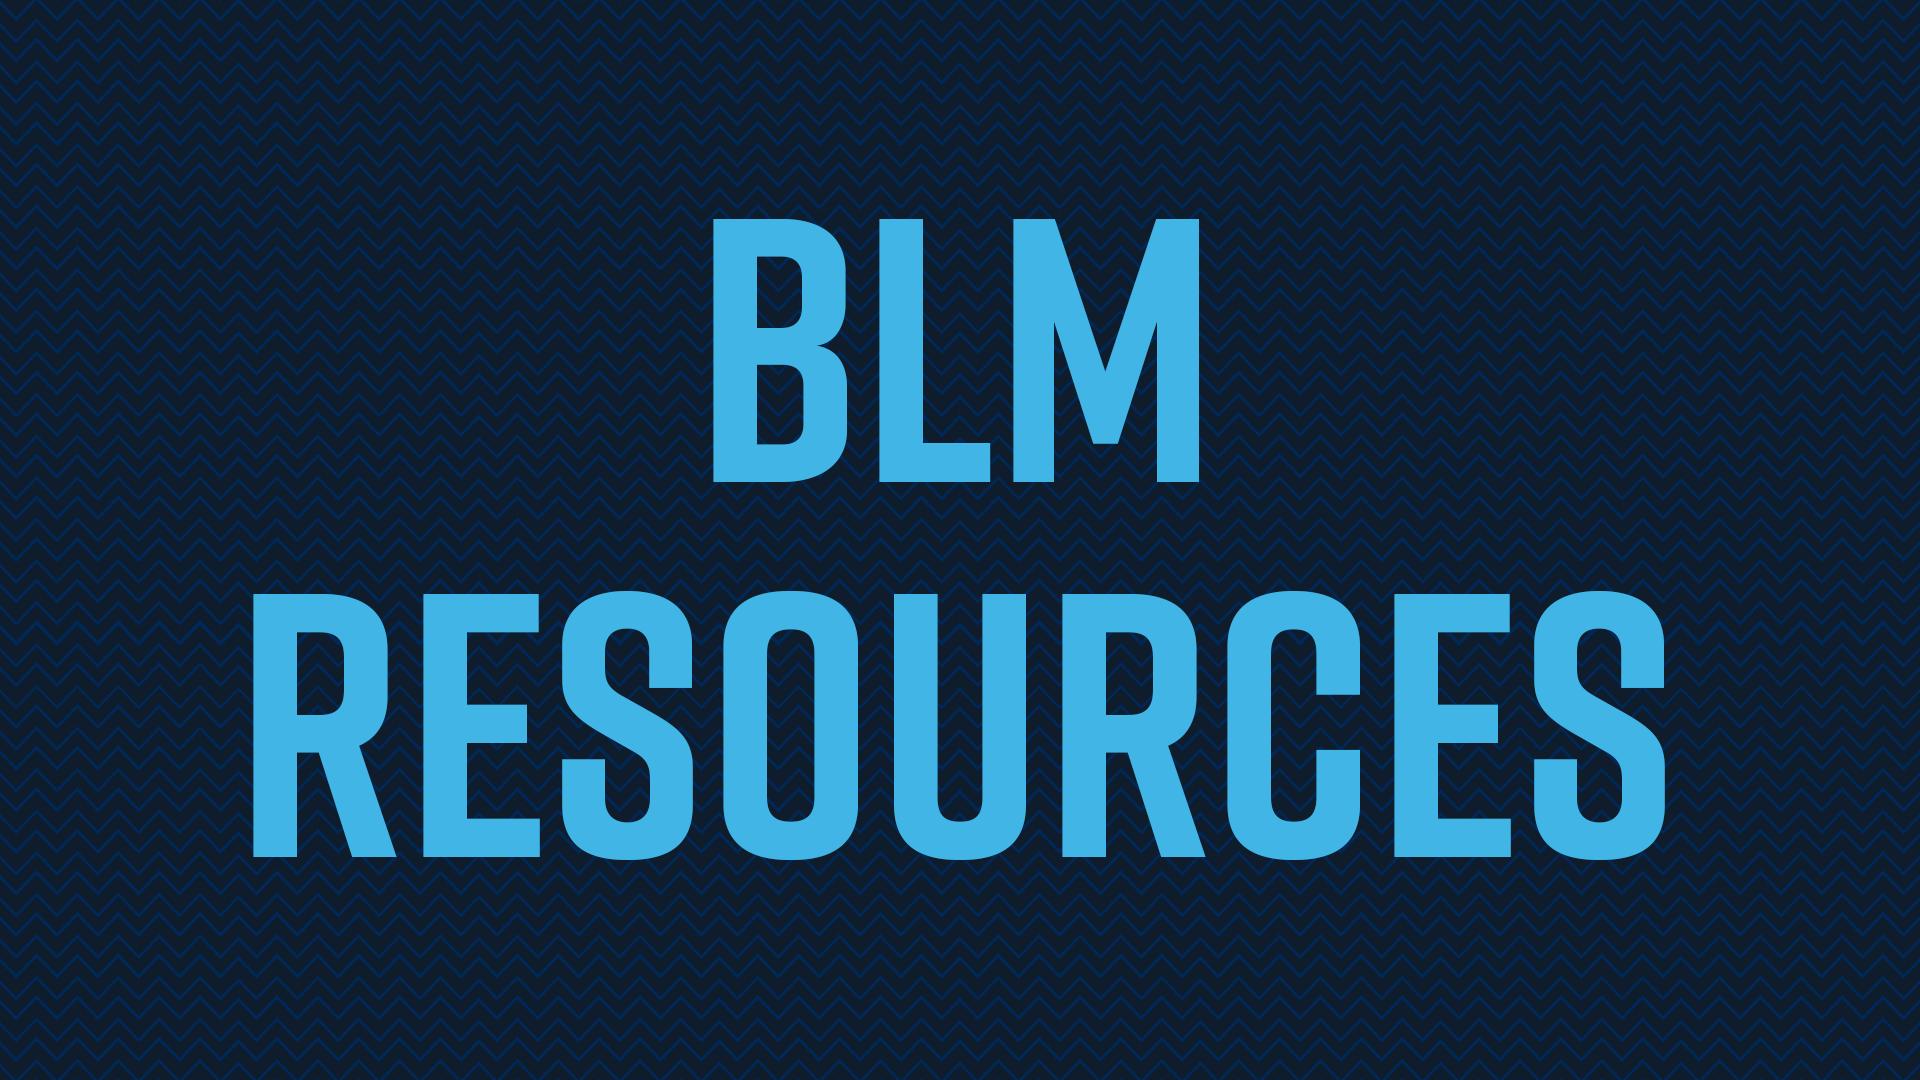 BLM resources